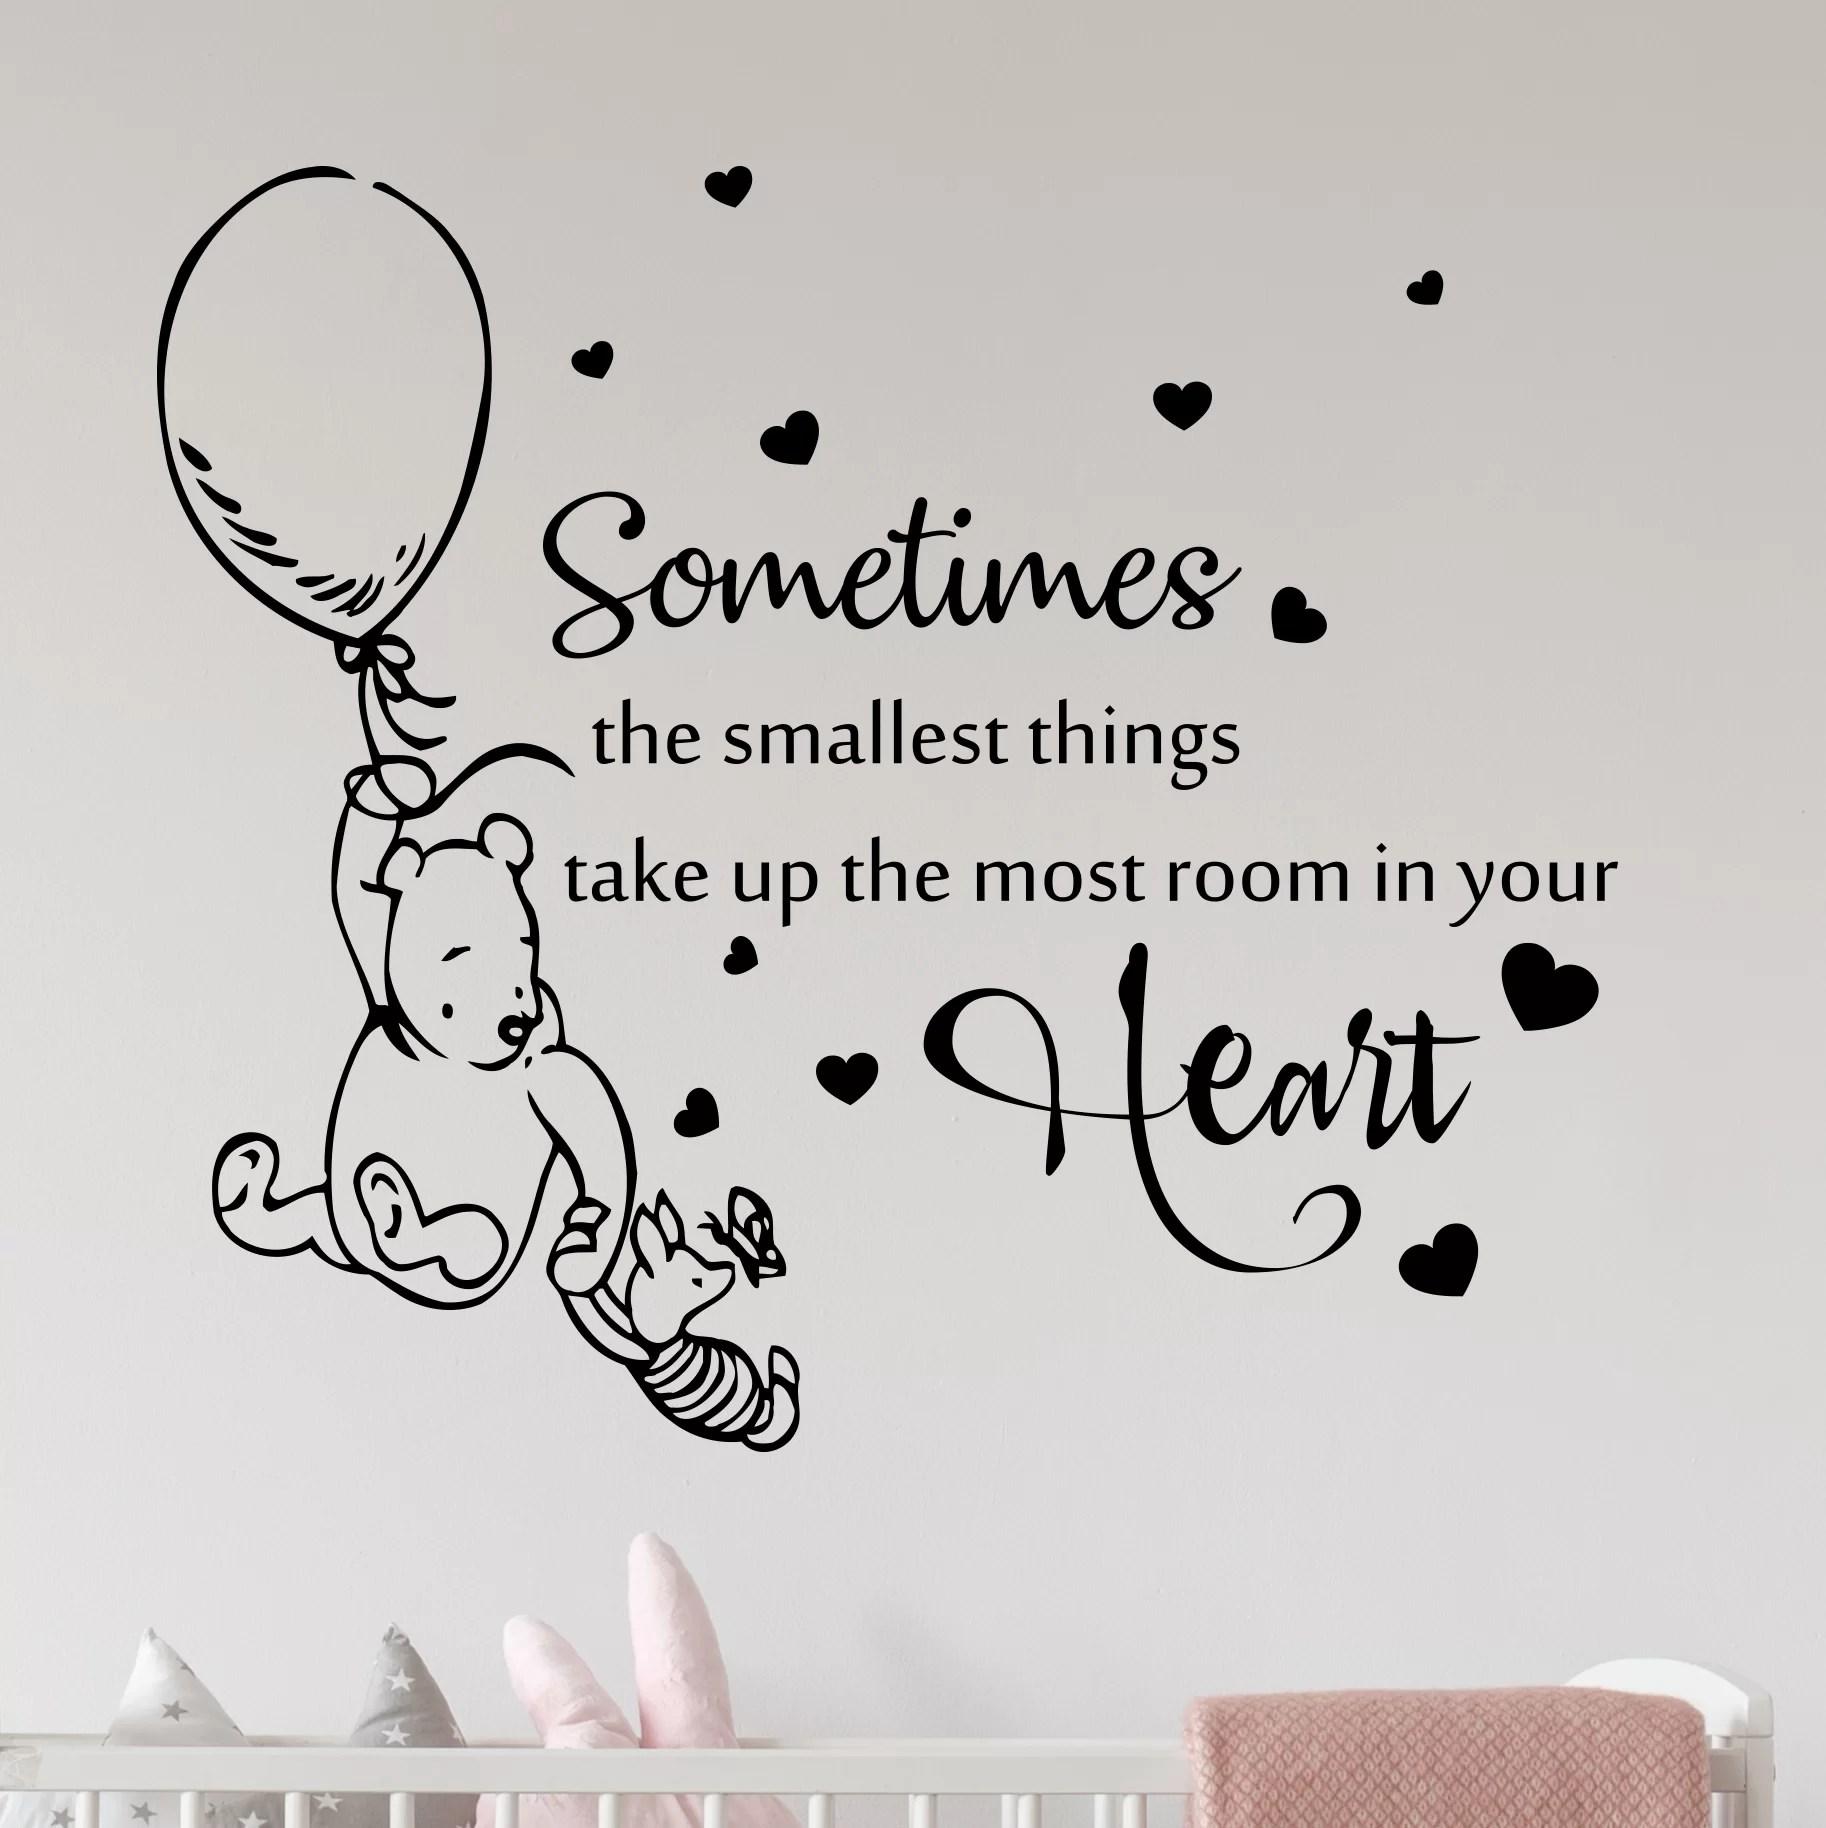 Home & Garden Winnie the pooh quote keep me in your heart wall art sticker children bedroom Wall Decals & Stickers merkez-al-bourhan.com